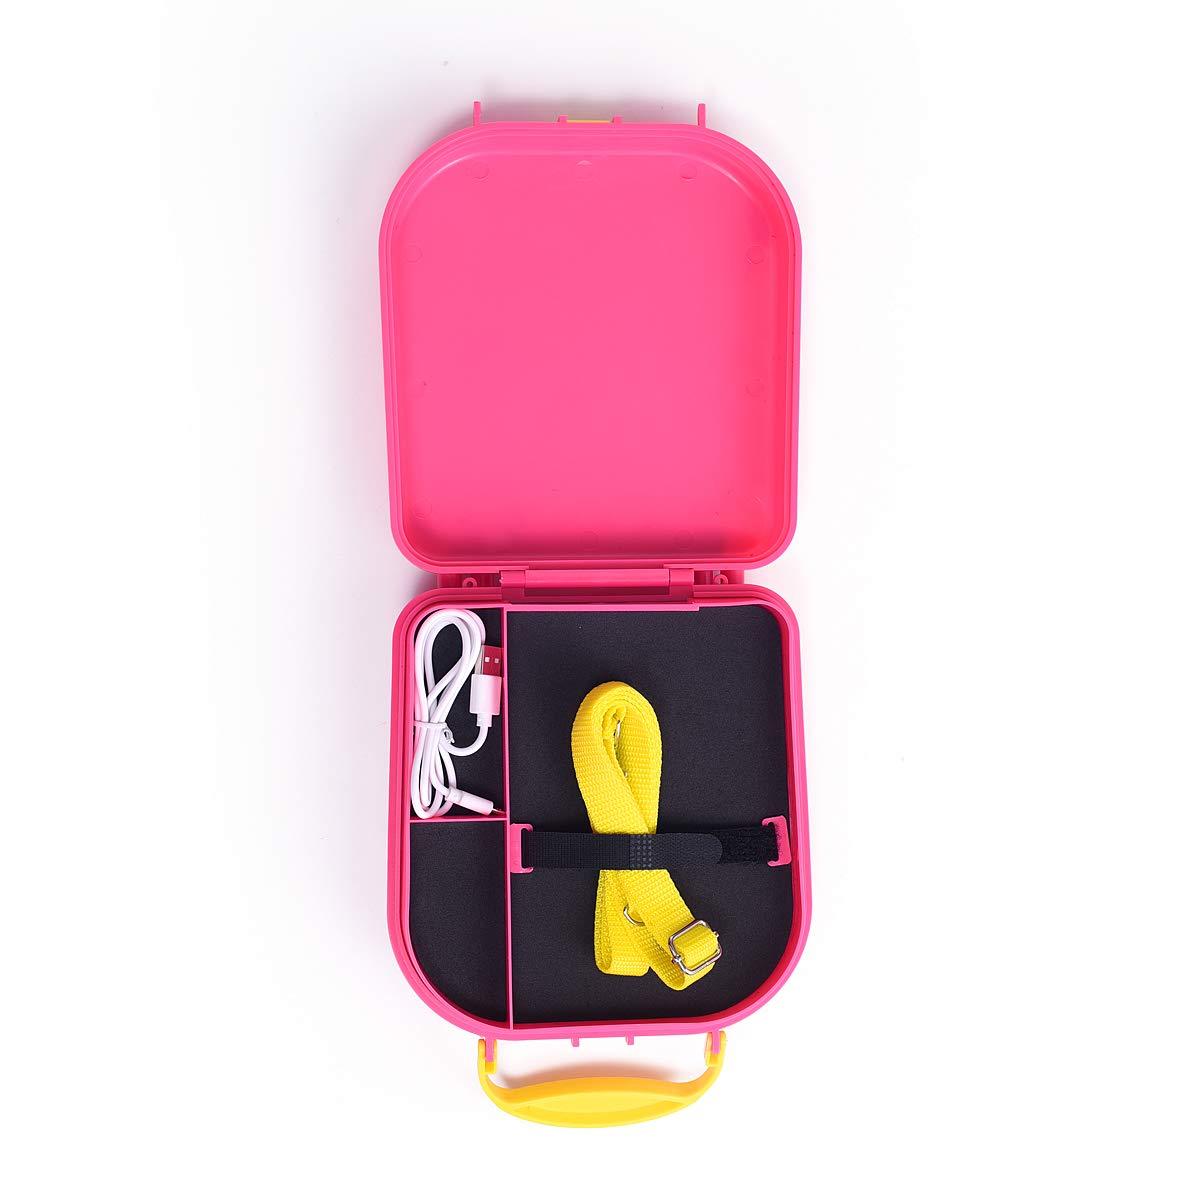 Bluetooth Speaker Children's Karaoke Speaker Portable Microphone Beach Handbag Karaoke Bluetooth Speaker Wireless Cartoon Speaker for Kids for Indoor Outdoor Travel Activities with Microphone (Pink) by HowQ (Image #4)